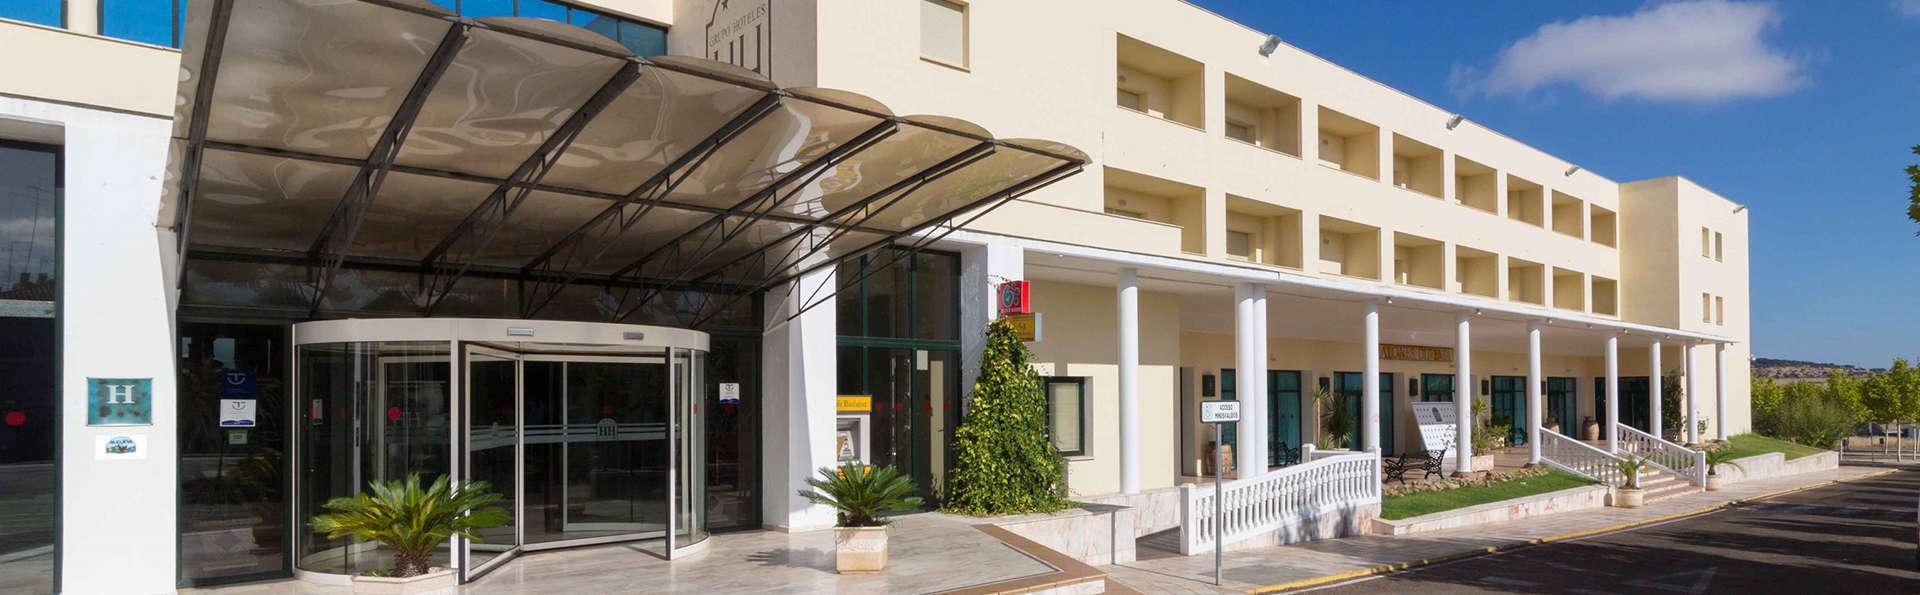 Hotel Heredero - Edit_Front.jpg